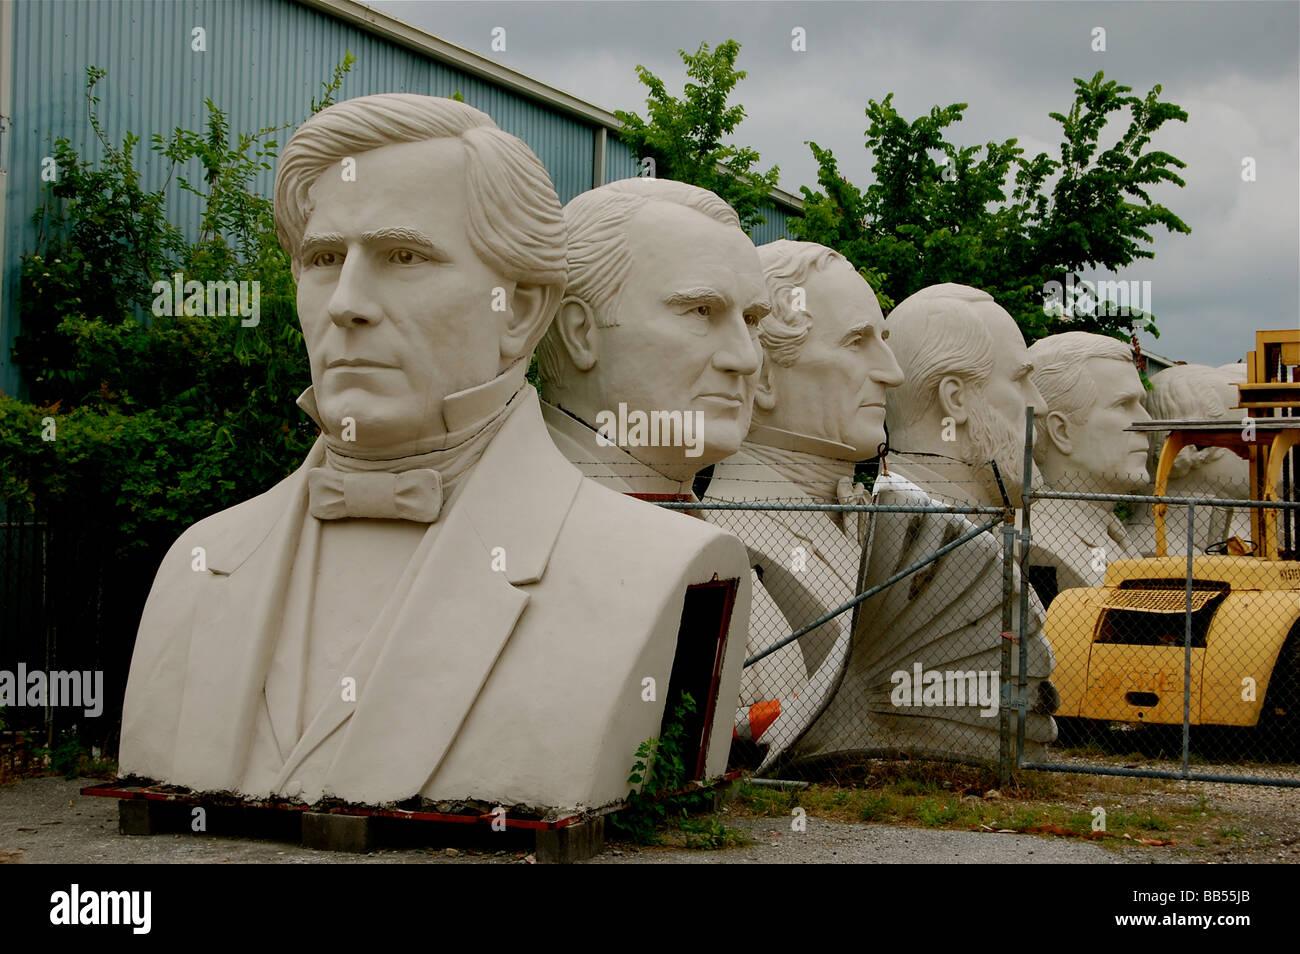 Los jefes del presidente a David Adicke's Studio en Houston, Texas Foto de stock